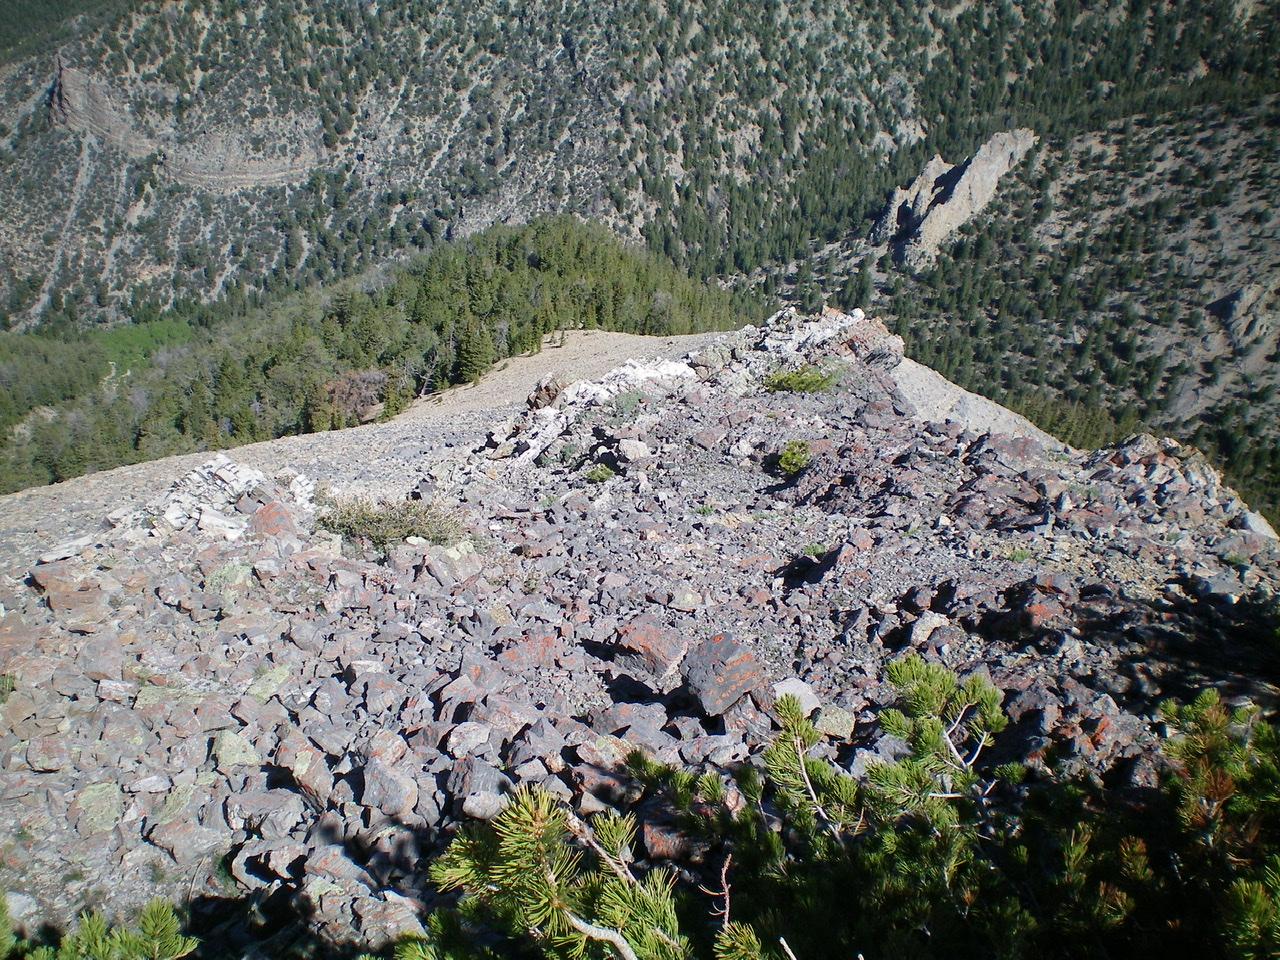 Looking down the steep Northwest Ridge of Peak 10104 from the summit. Livingston Douglas Photo